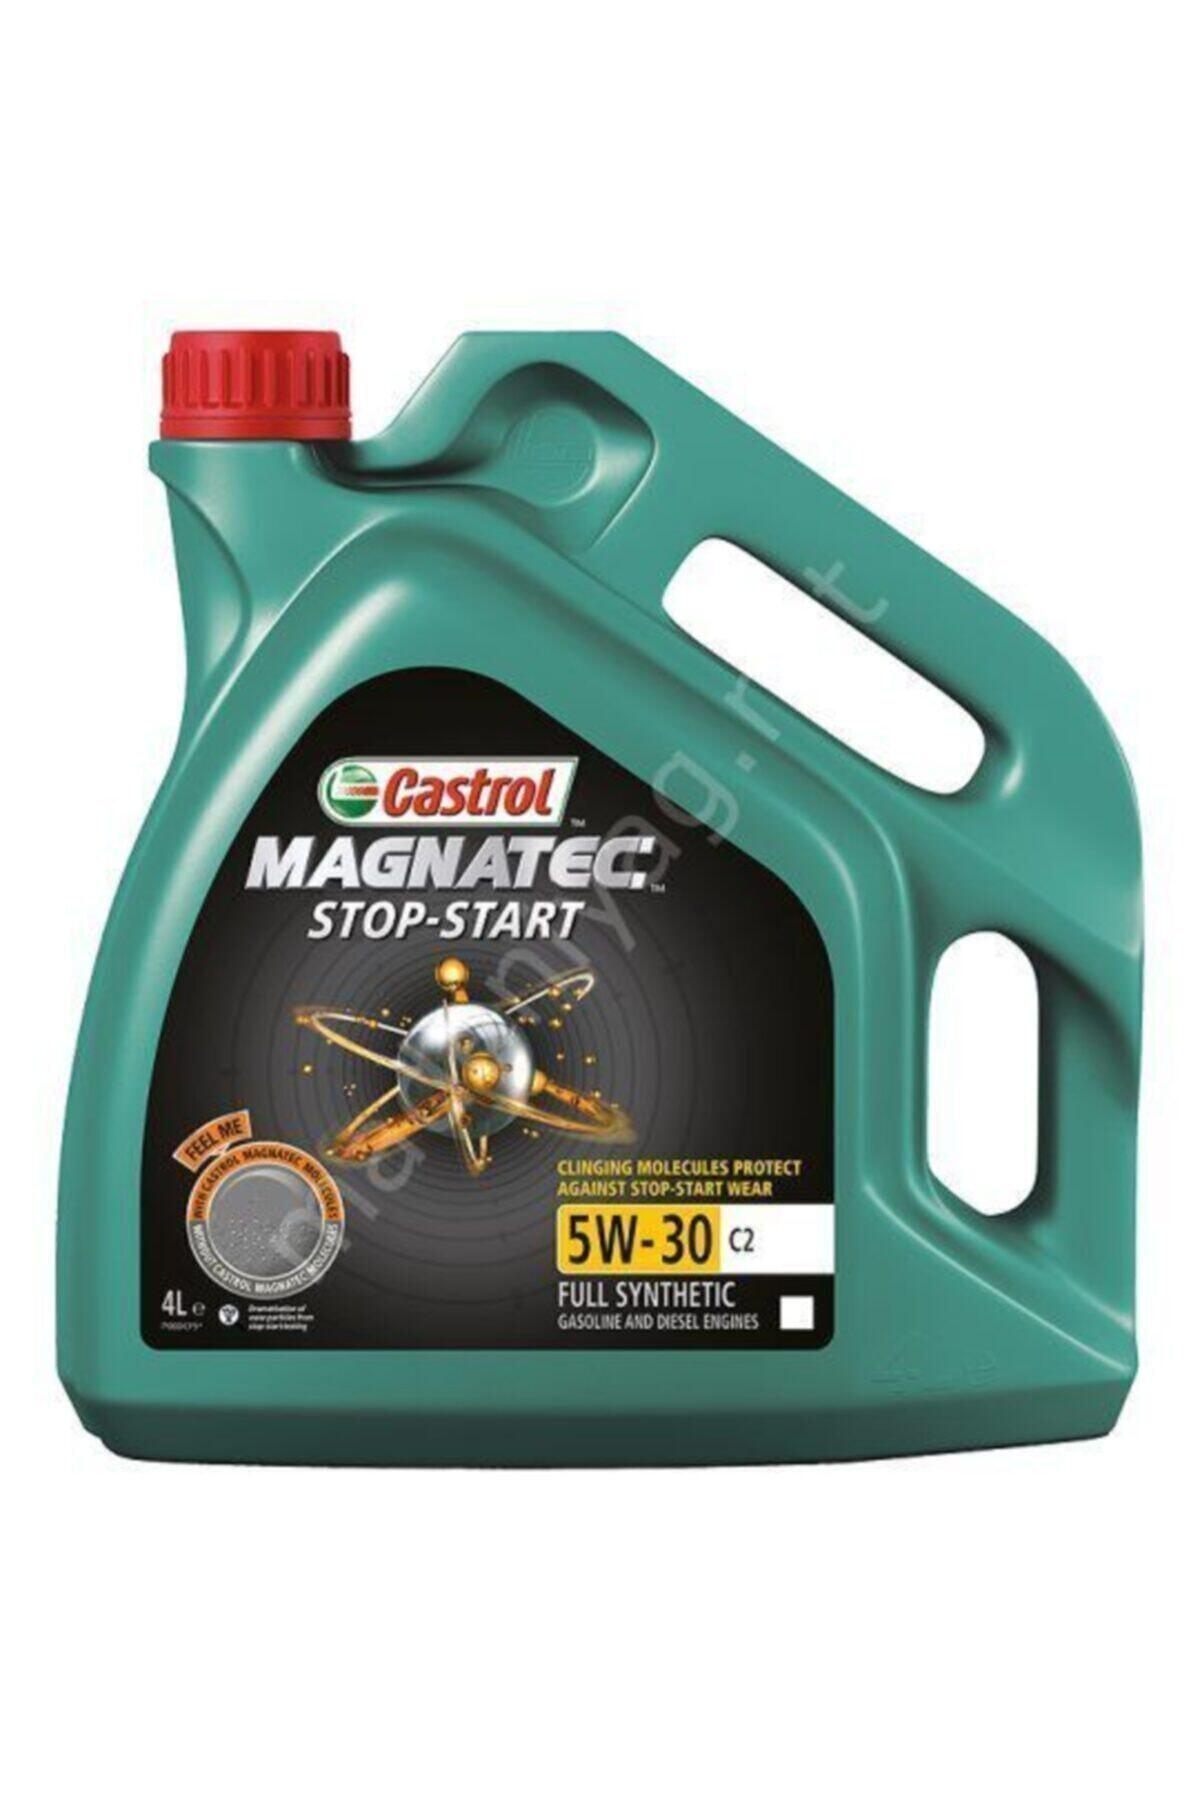 Magnatec 5w 30 C2 4 Lt 2020 Tarihli Psa Approval B71 2290 Onaylı